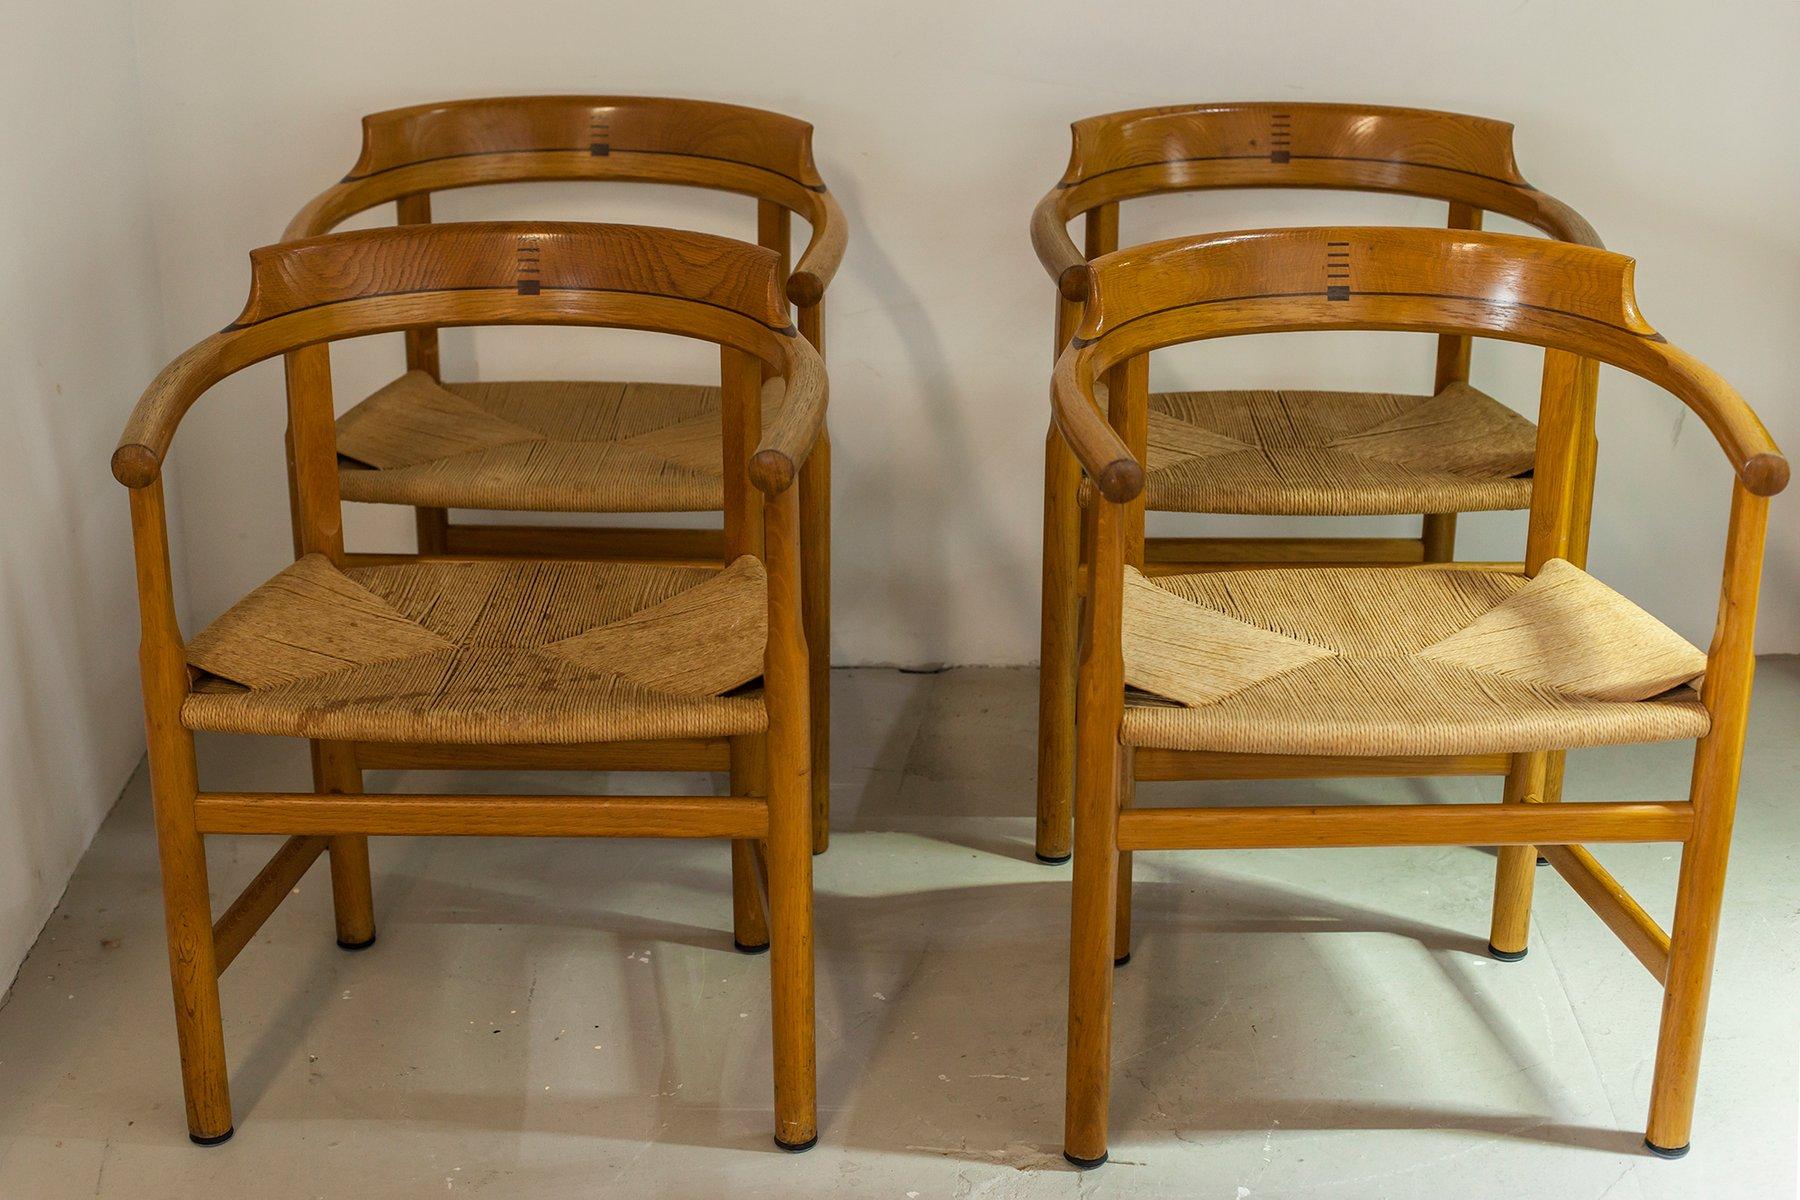 d nische st hle modell pp62 von hans j wegner 1960er 4er set bei pamono kaufen. Black Bedroom Furniture Sets. Home Design Ideas